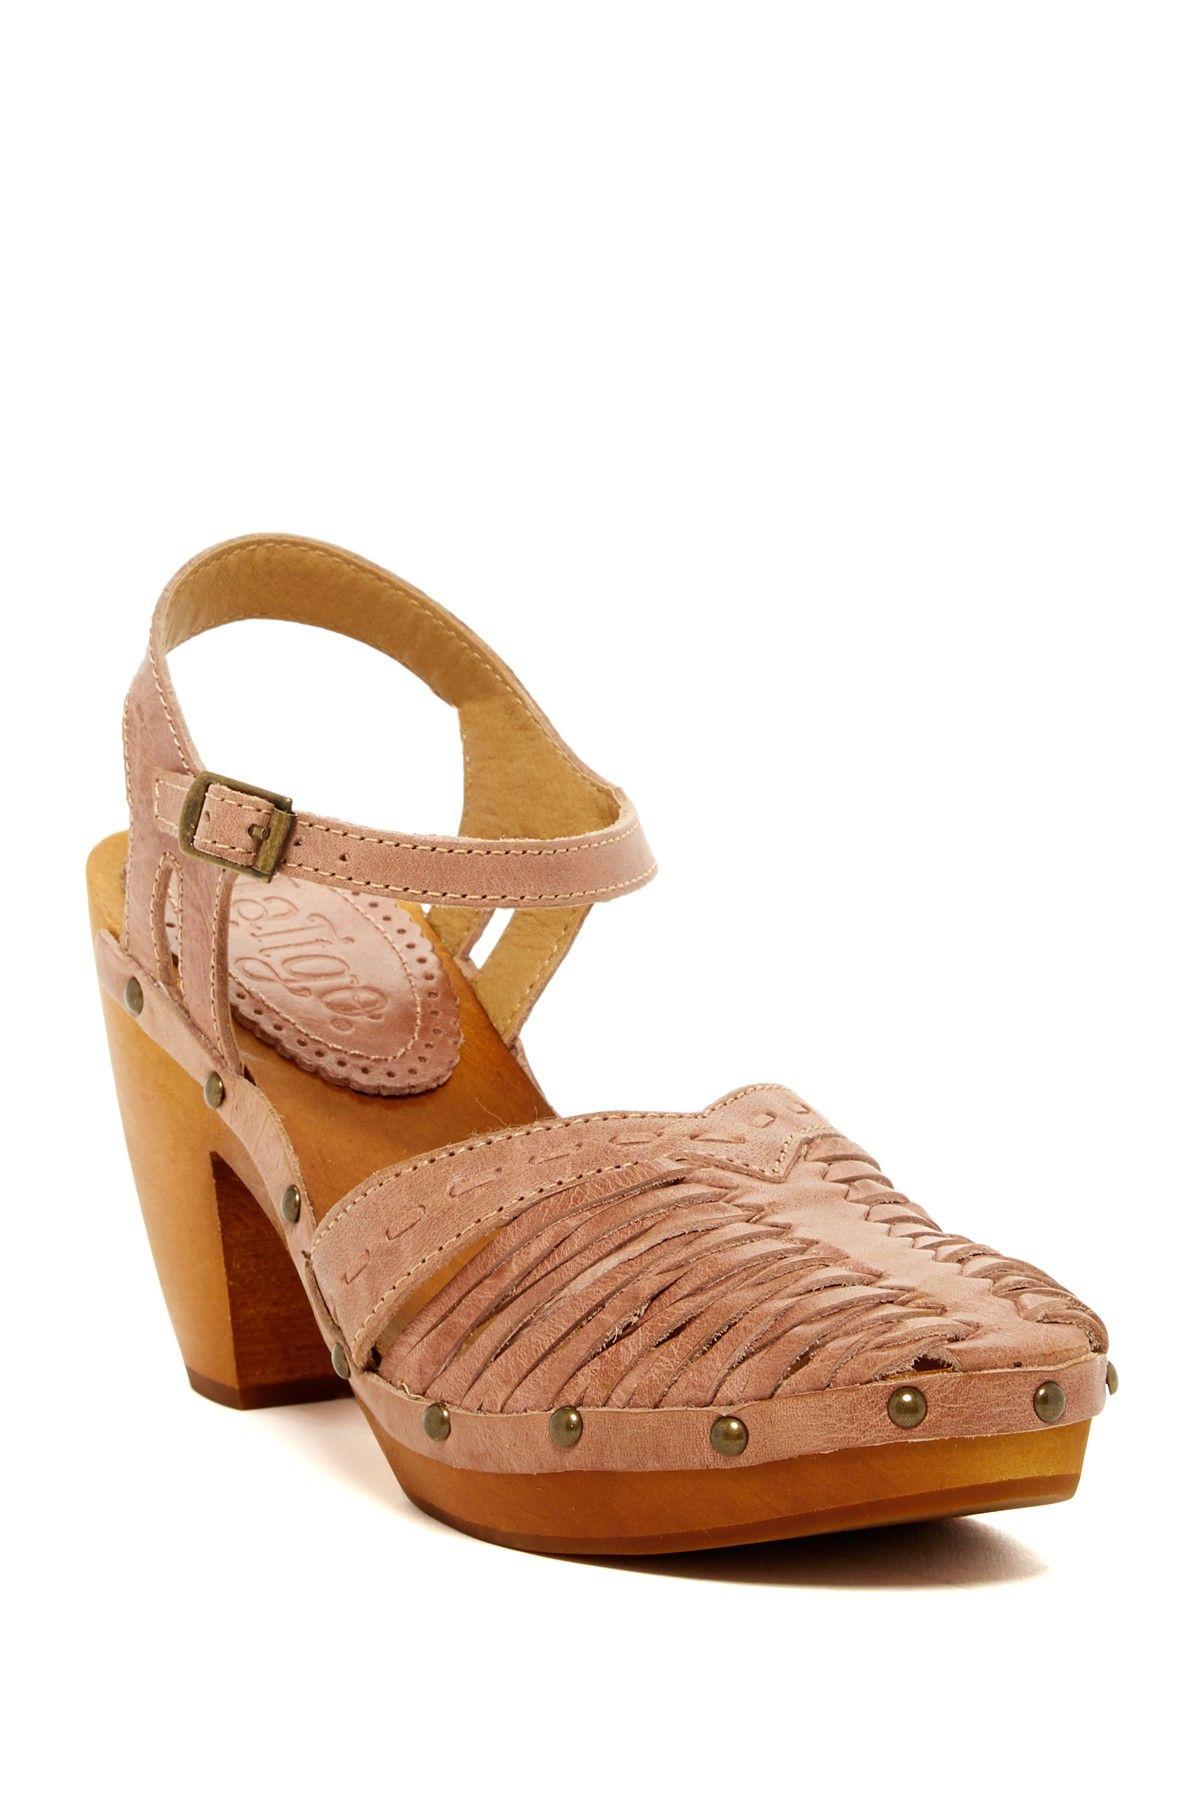 Latigo - Costa Stacked Heel Sandal at Nordstrom Rack. Free Shipping on  orders over $100